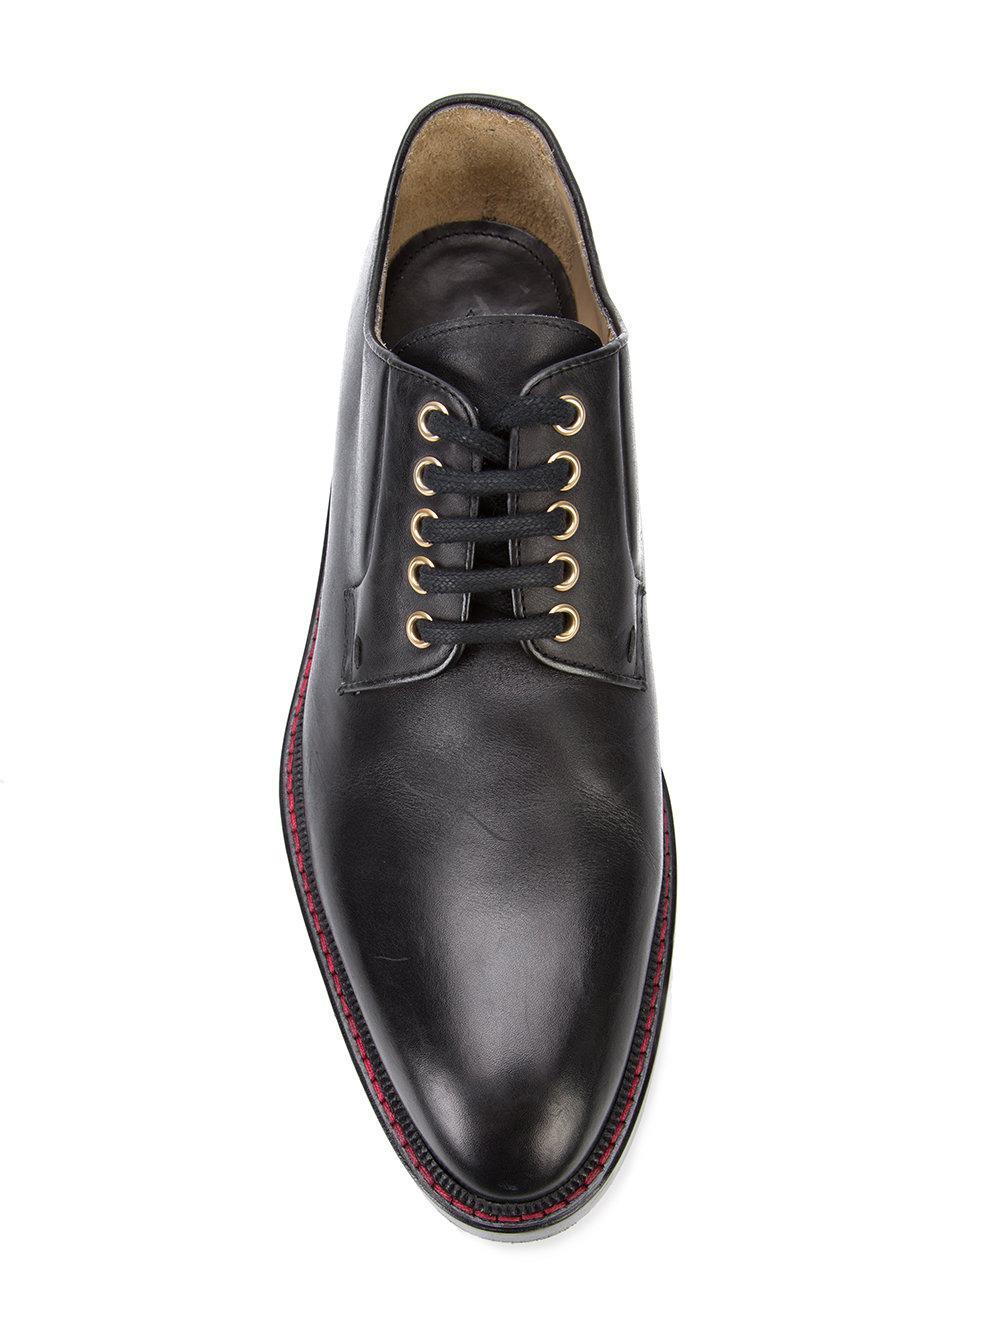 Demir derby shoes - Black PAUL ANDREW QowpjyVc2C